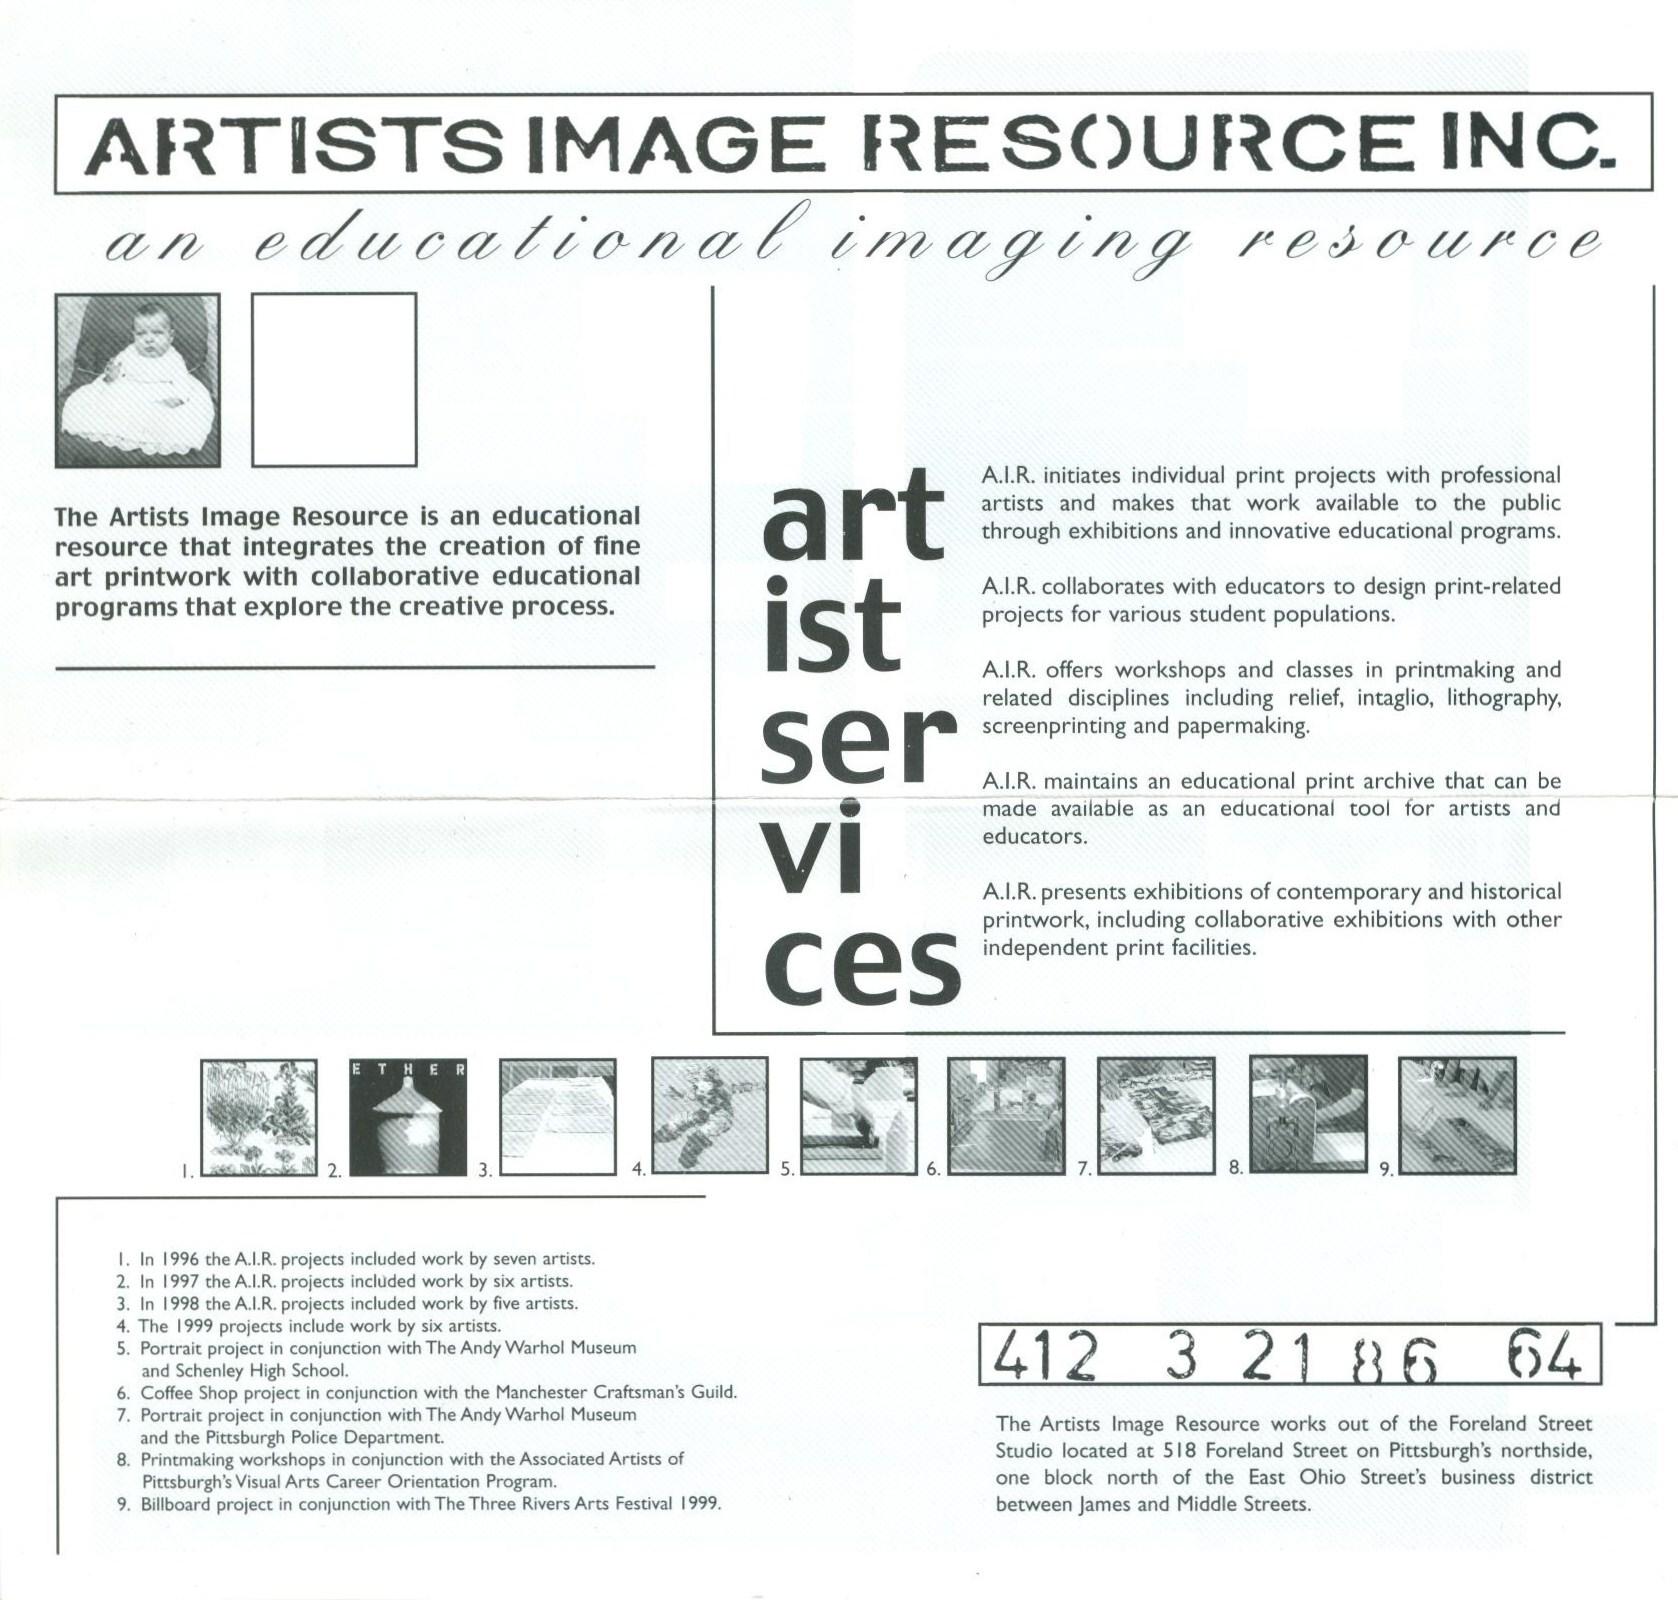 ArtistImageResource2 001.jpg